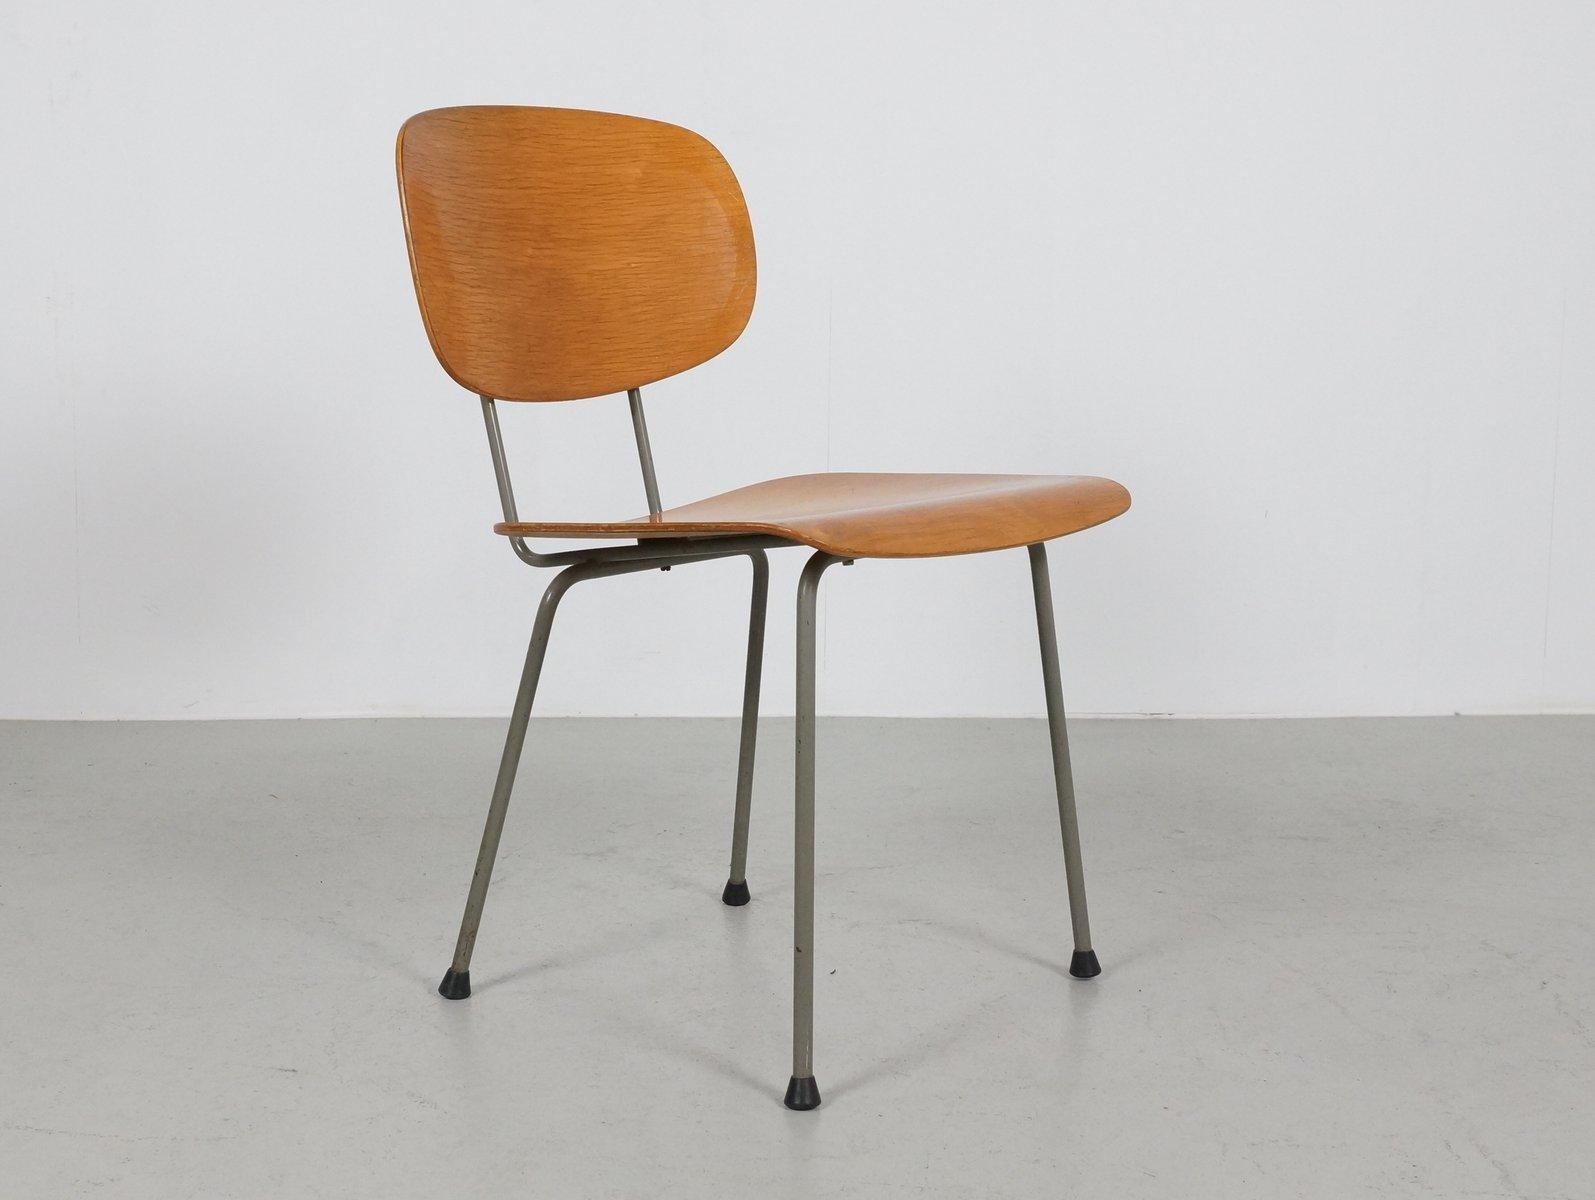 modell 116 stuhl von wim rietveld f r gispen 1952 bei. Black Bedroom Furniture Sets. Home Design Ideas